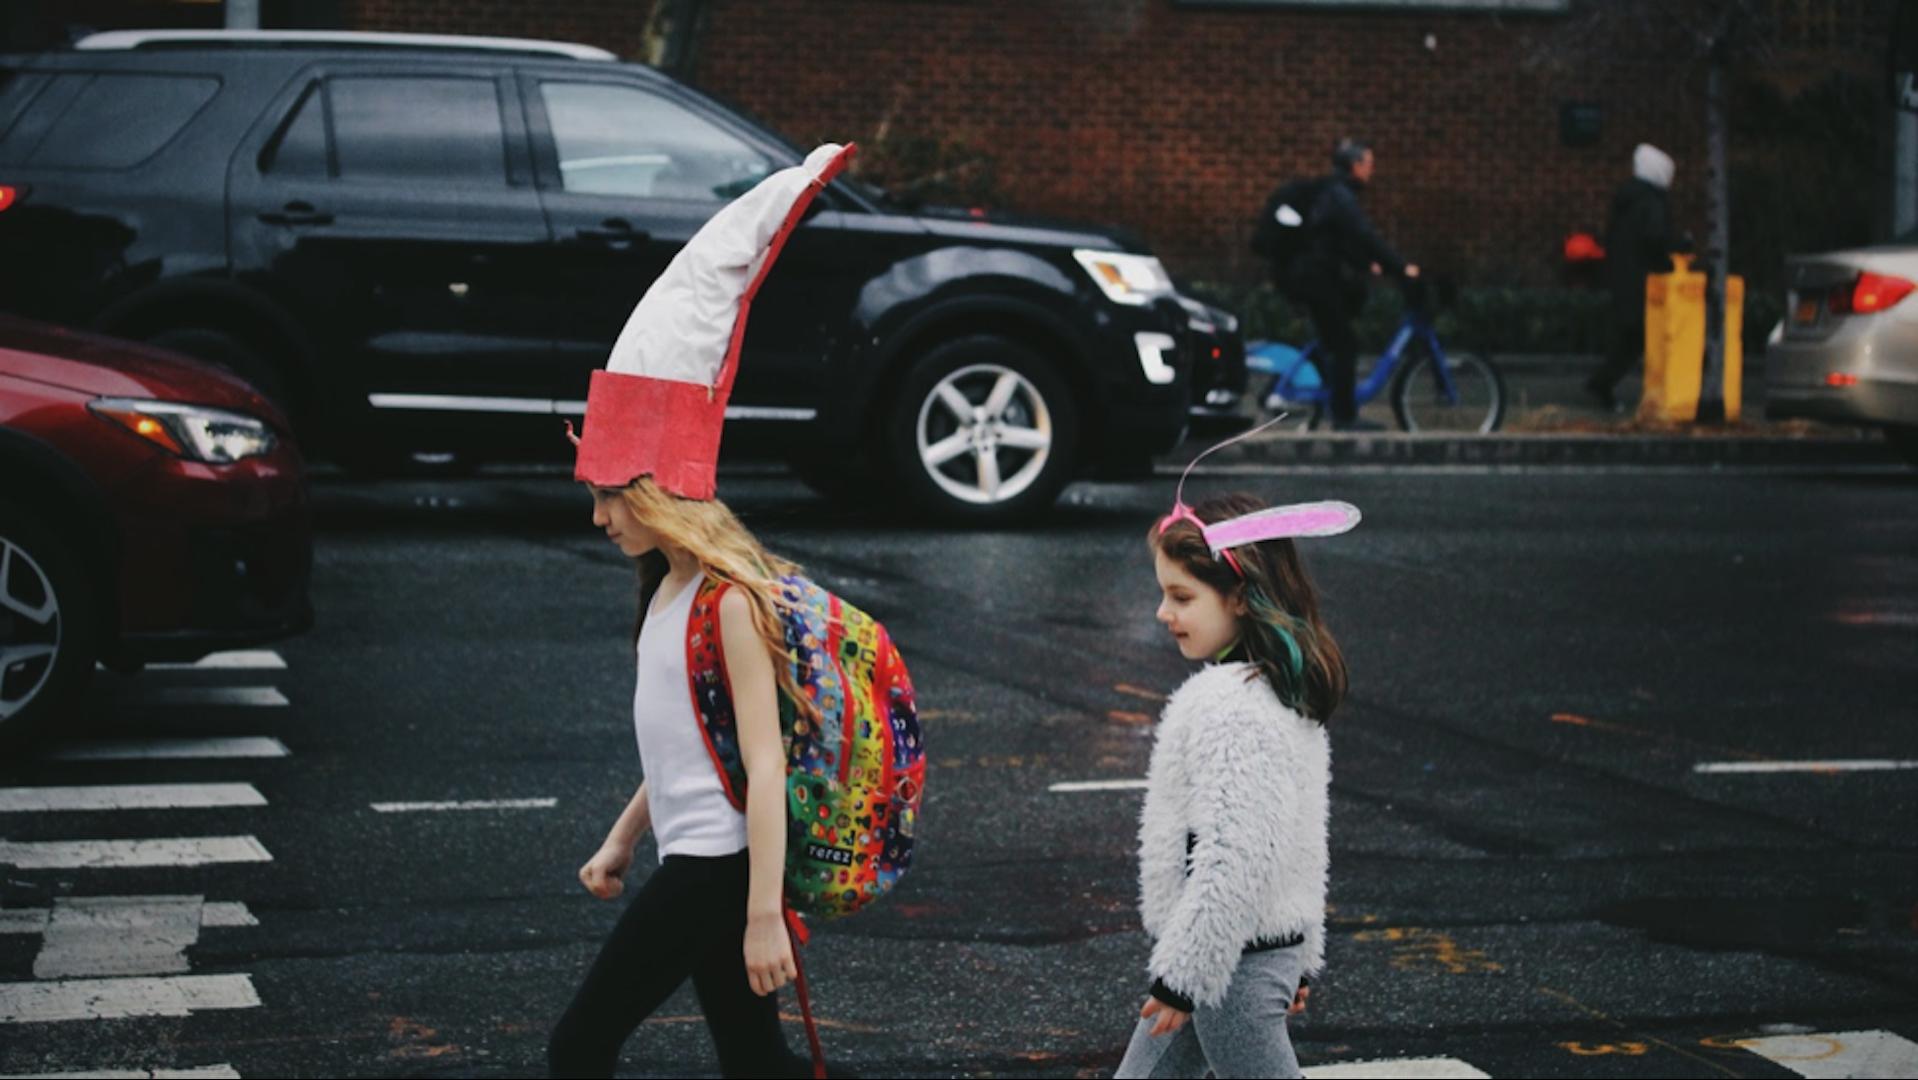 Two girls walking on a sidewalk as a car drives by.